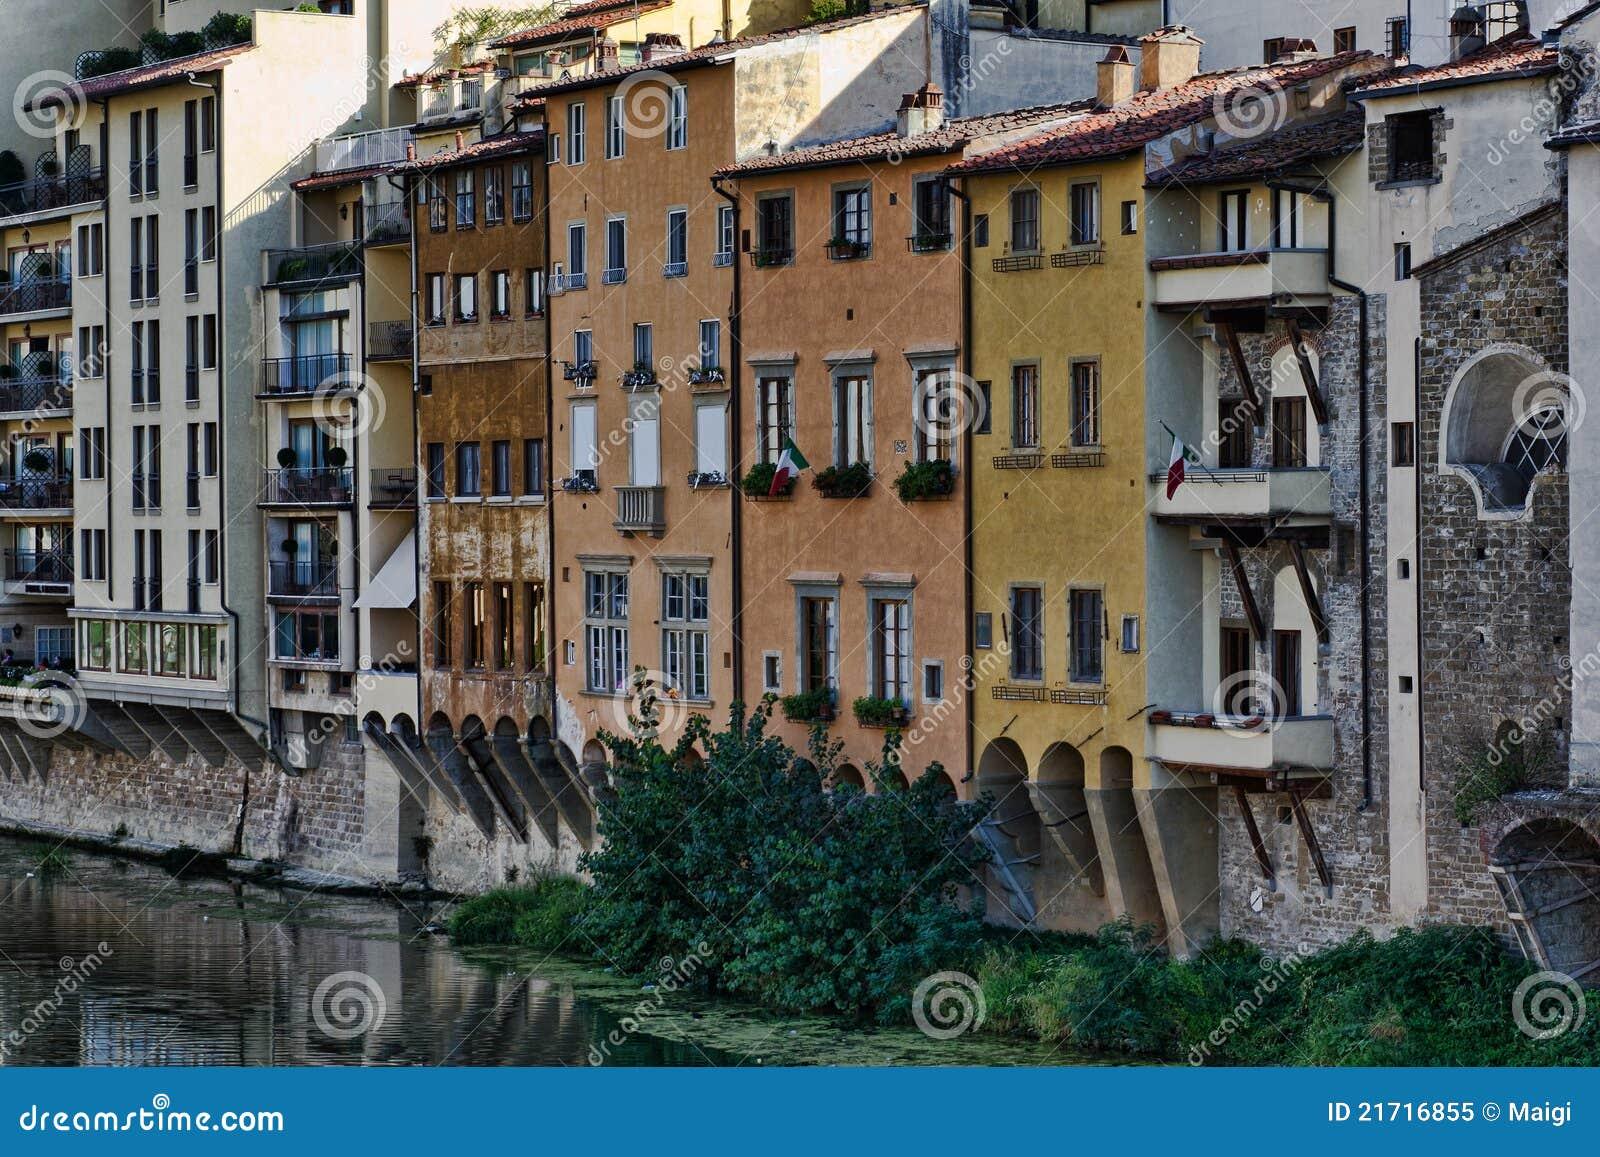 constructions par le fleuve d 39 arno italie image stock. Black Bedroom Furniture Sets. Home Design Ideas